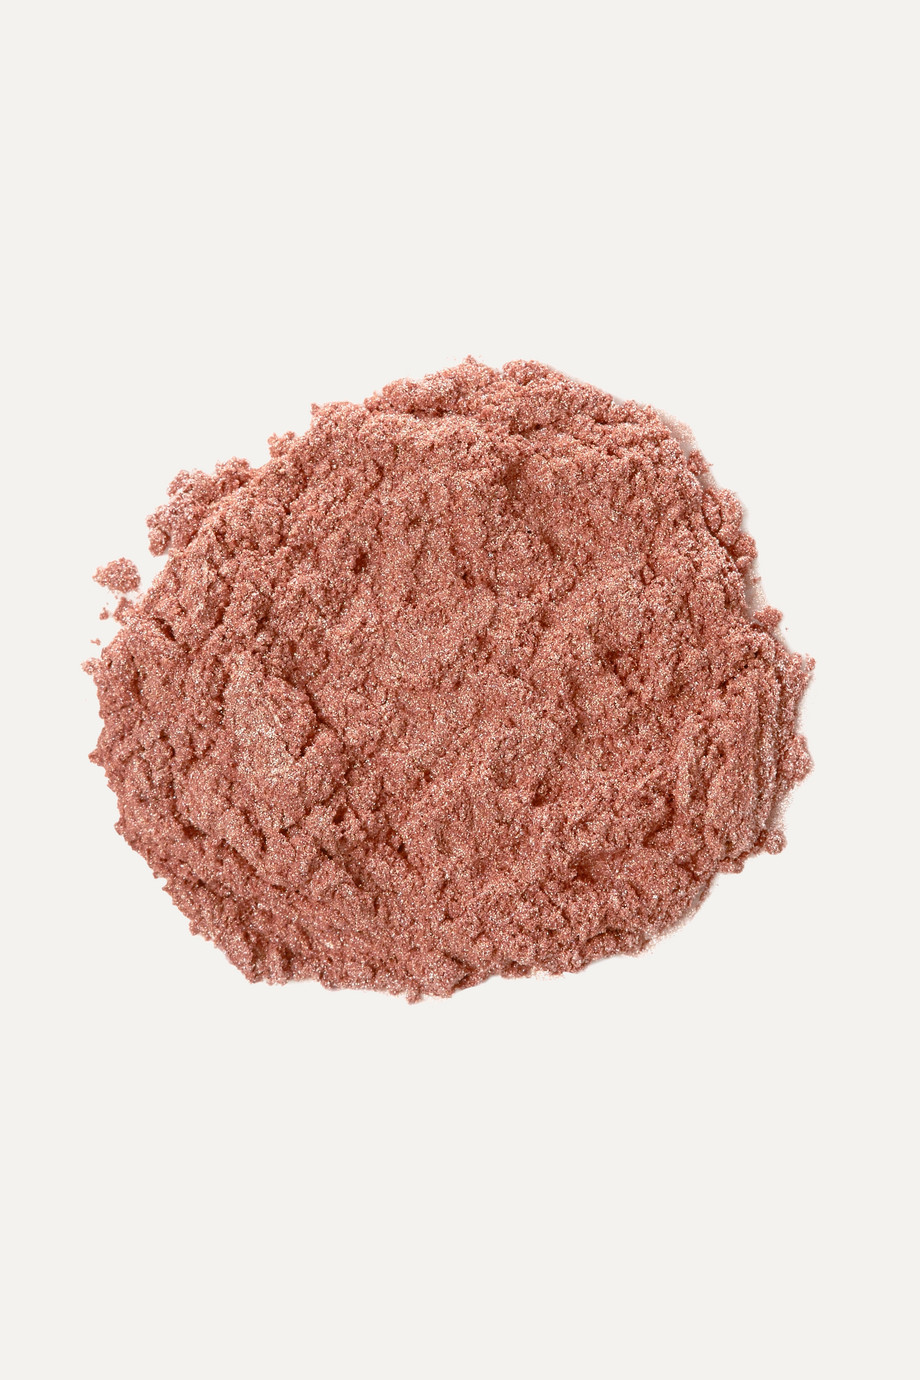 NARS Illuminating Loose Powder - Orgasm